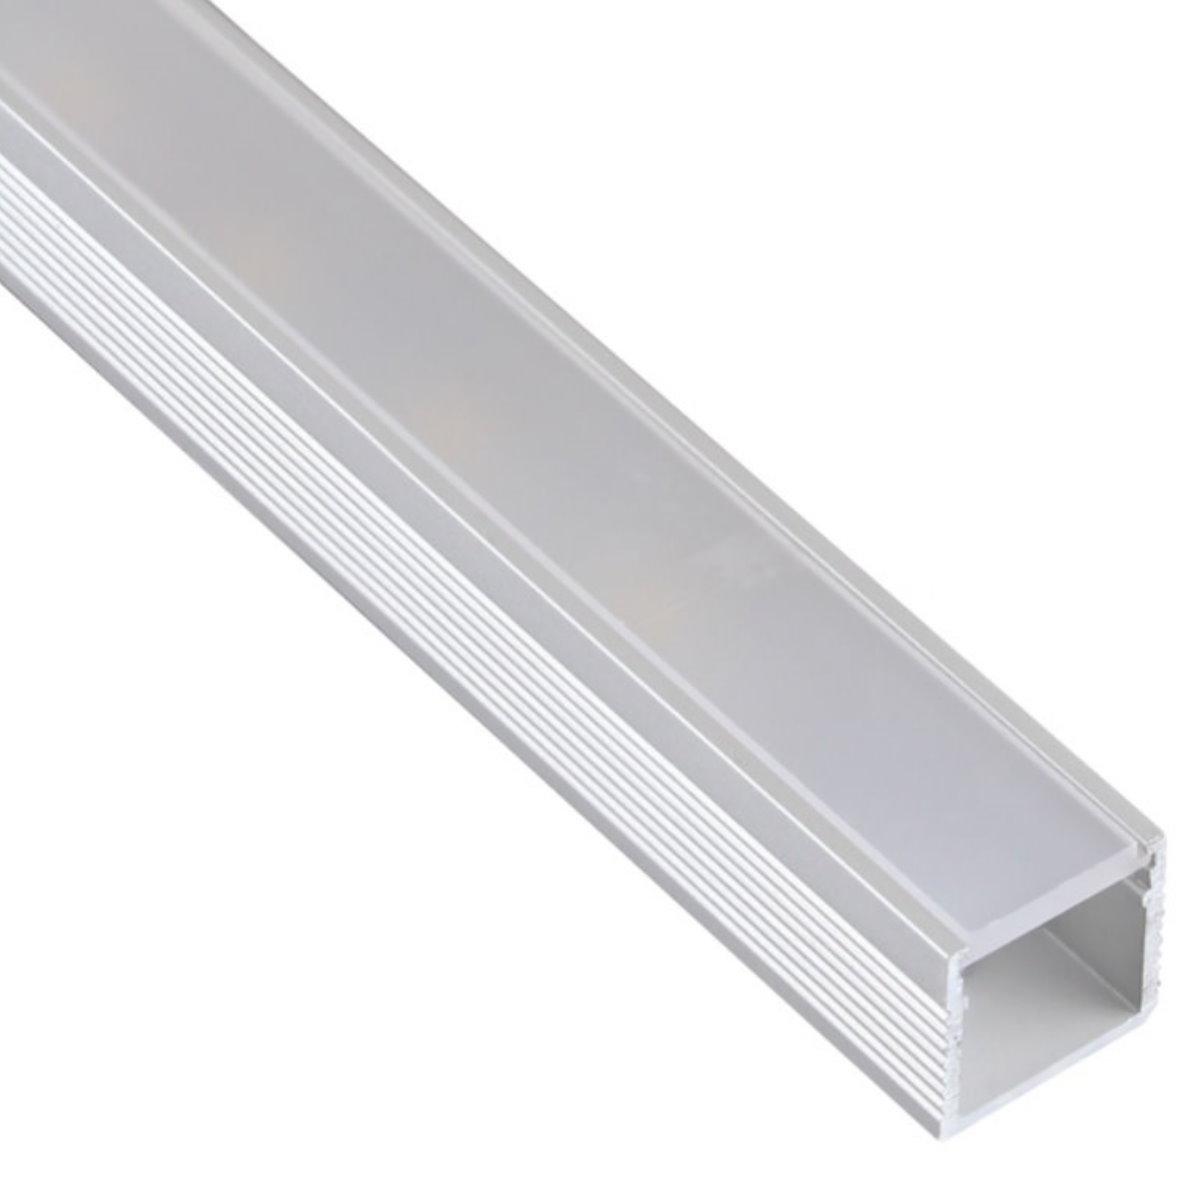 29 9 m led aluprofil alu profil schiene aluminium. Black Bedroom Furniture Sets. Home Design Ideas